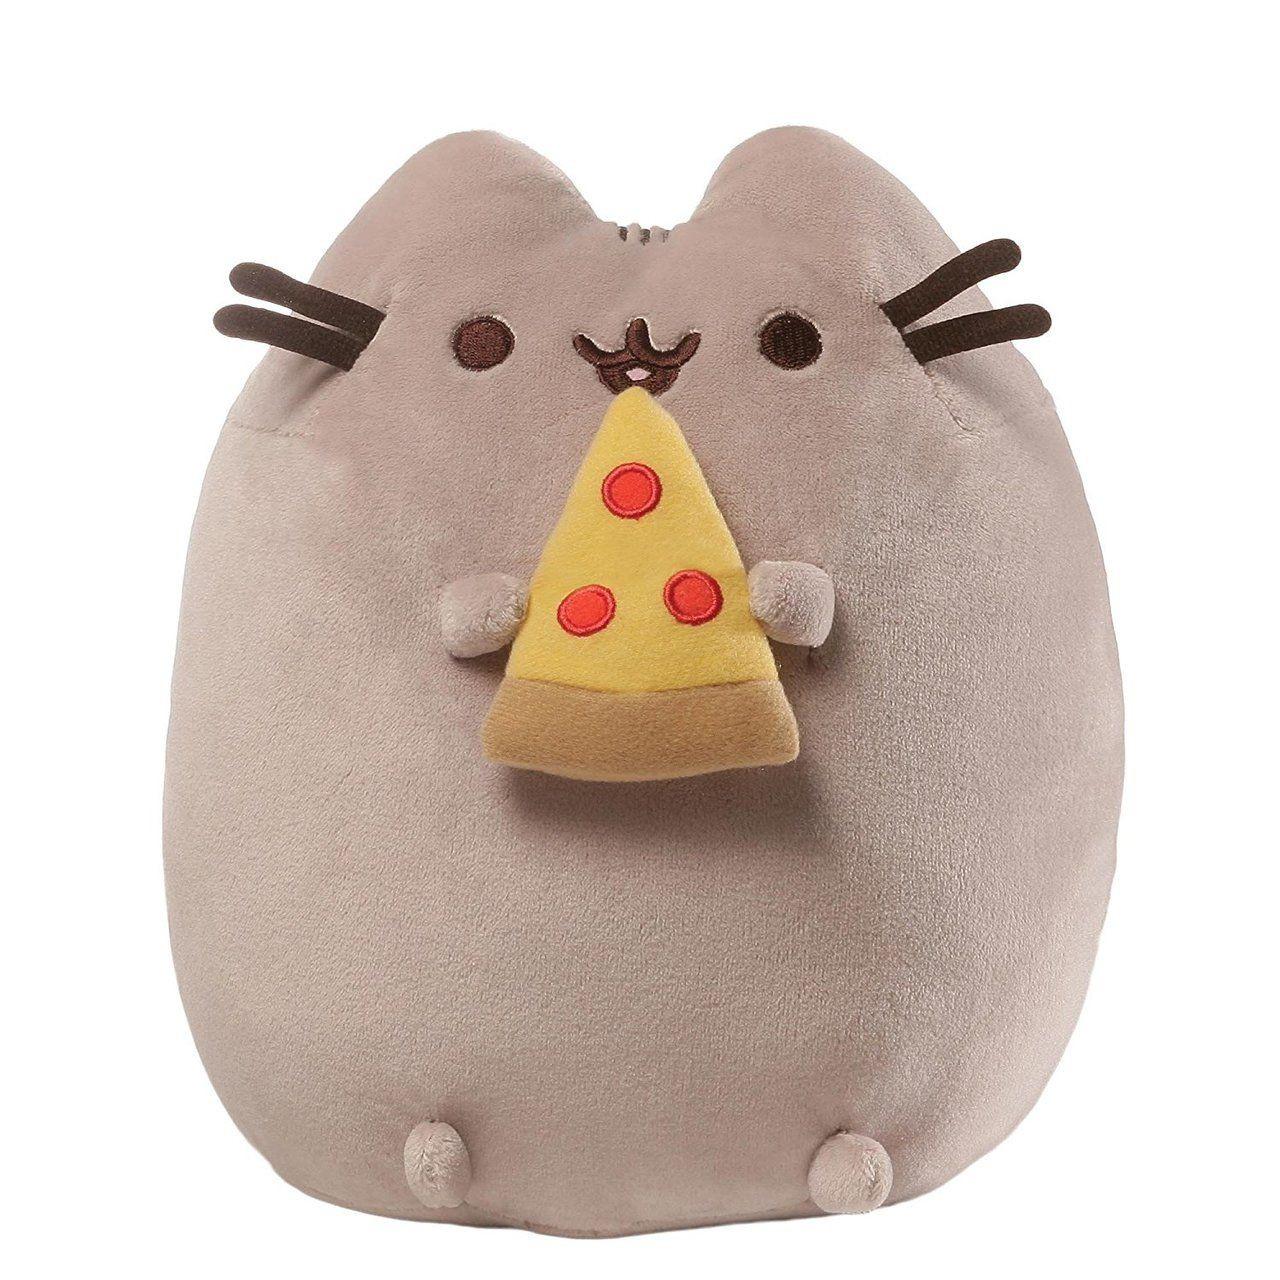 938a837ea26 GUND Pusheen Stuffed Animal Plush Cat with Pizza